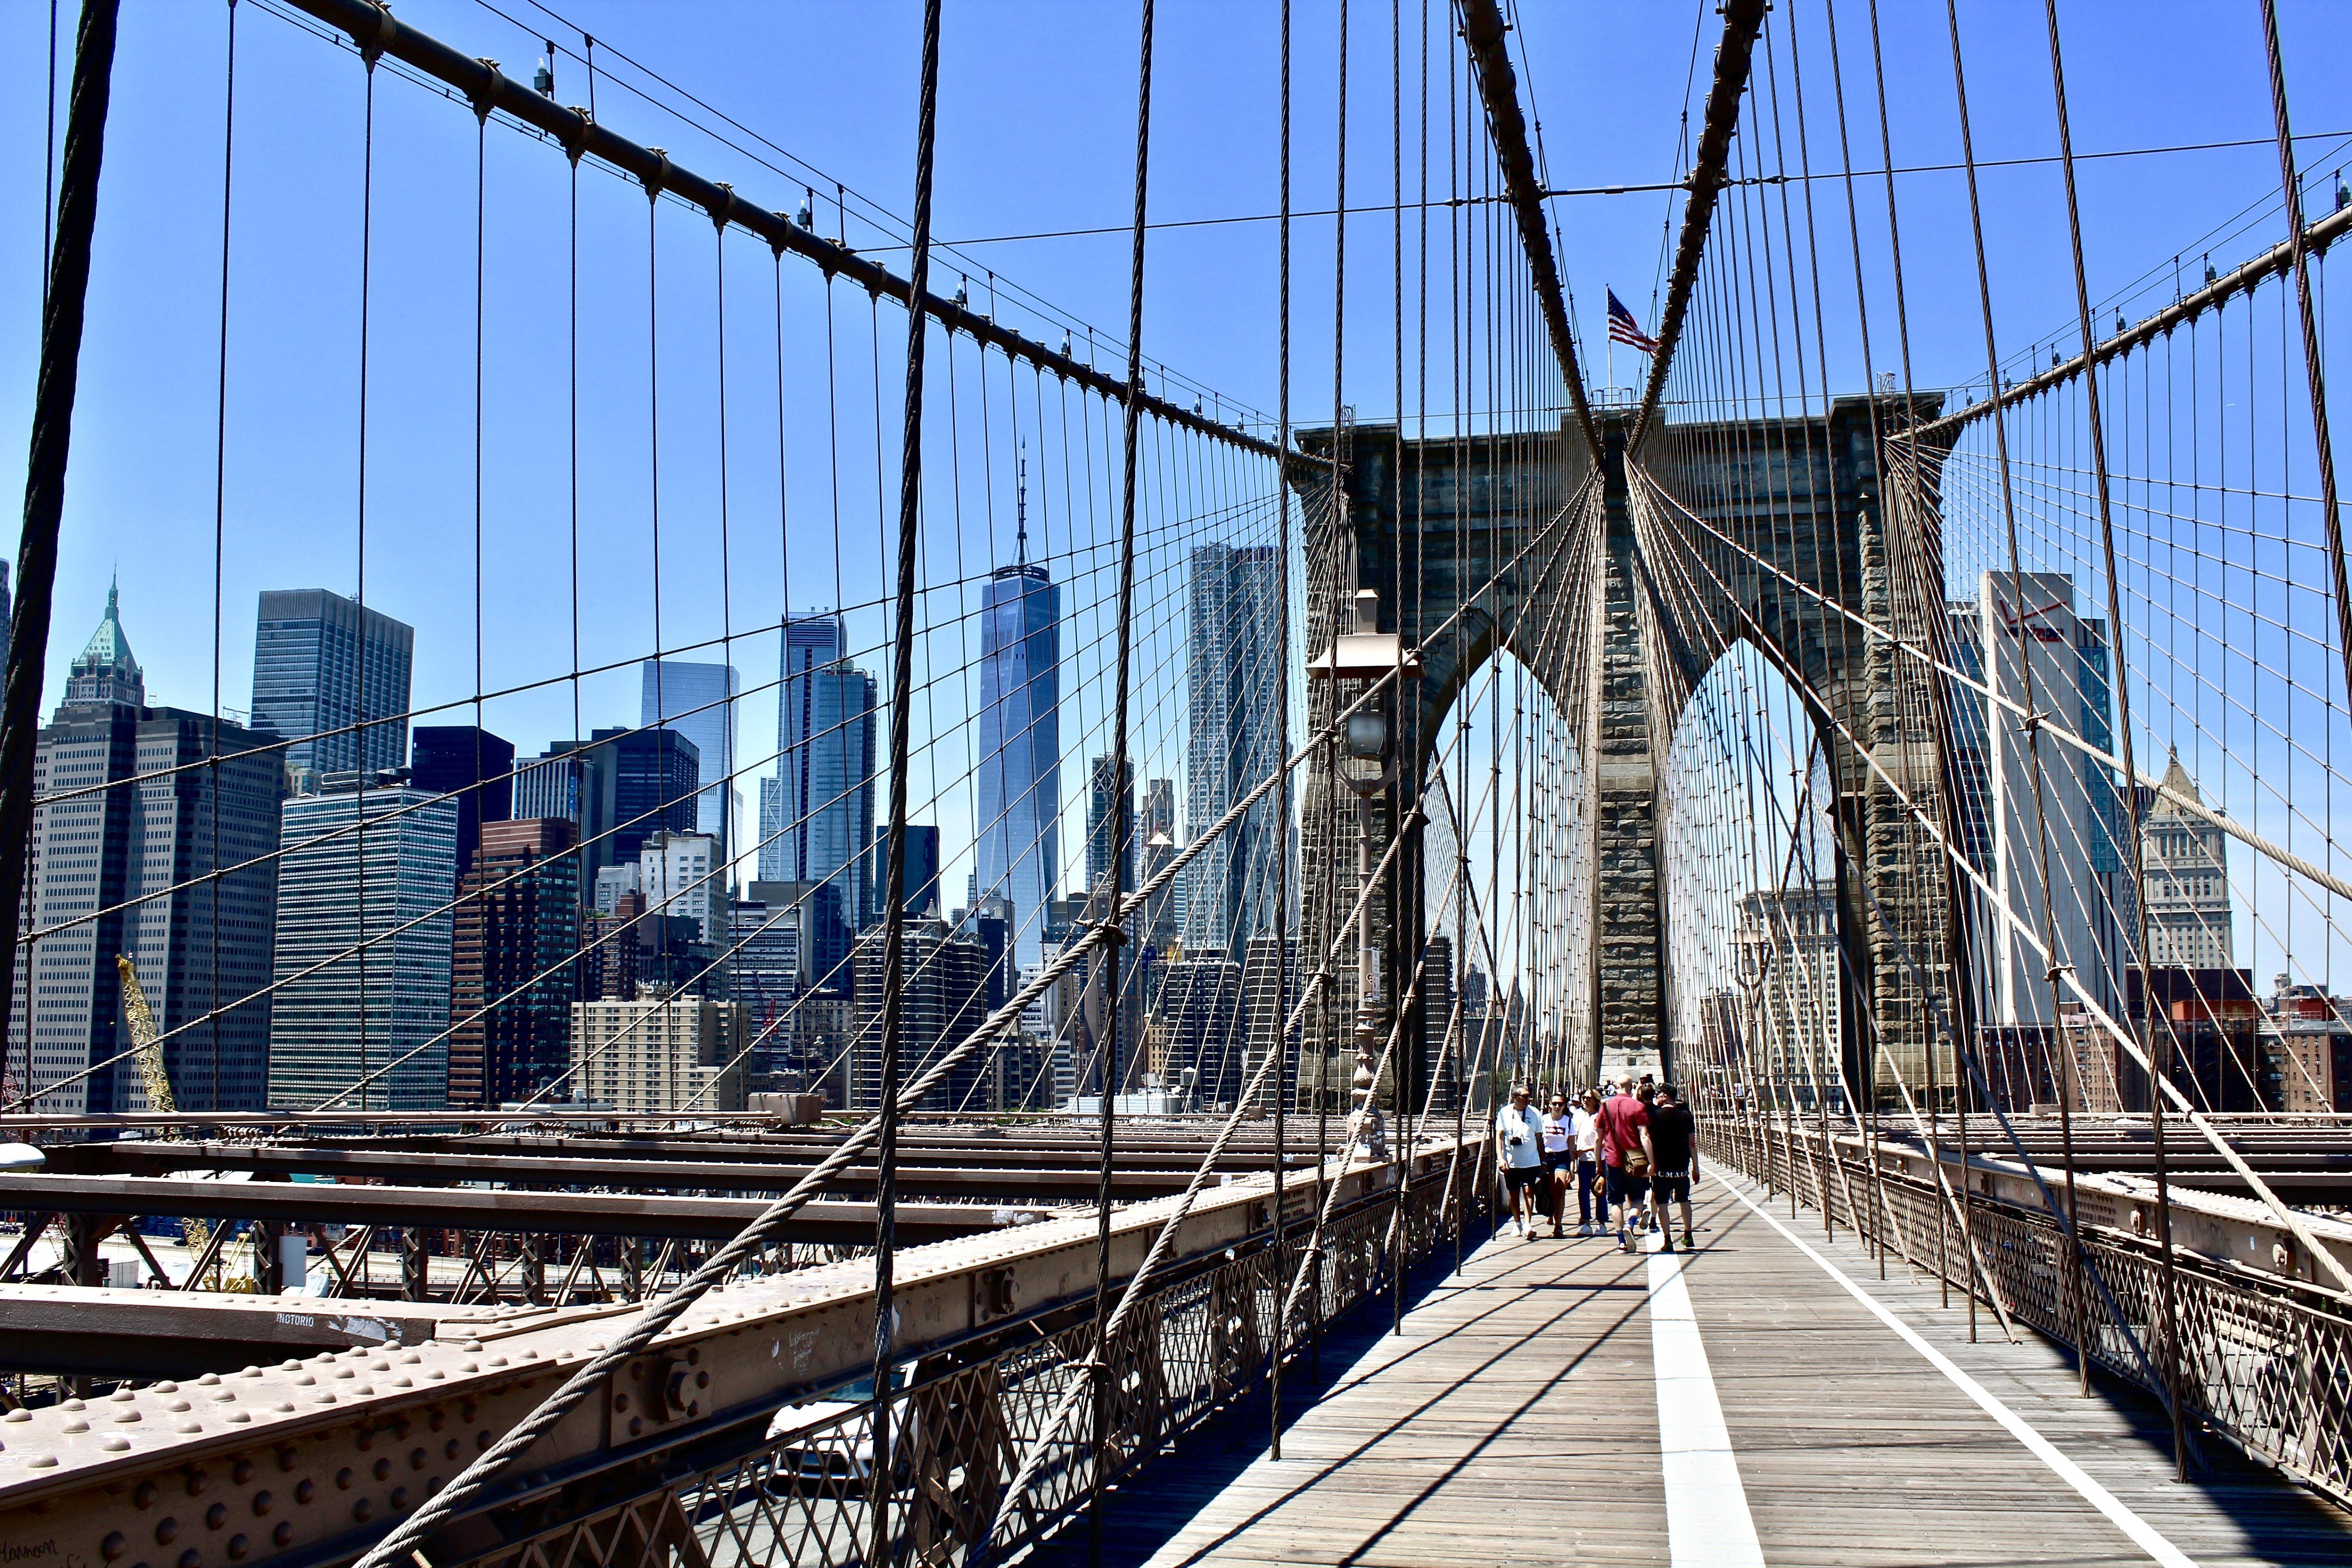 Applesandadventuresblog: Wordless Wednesday Brooklyn Bridge